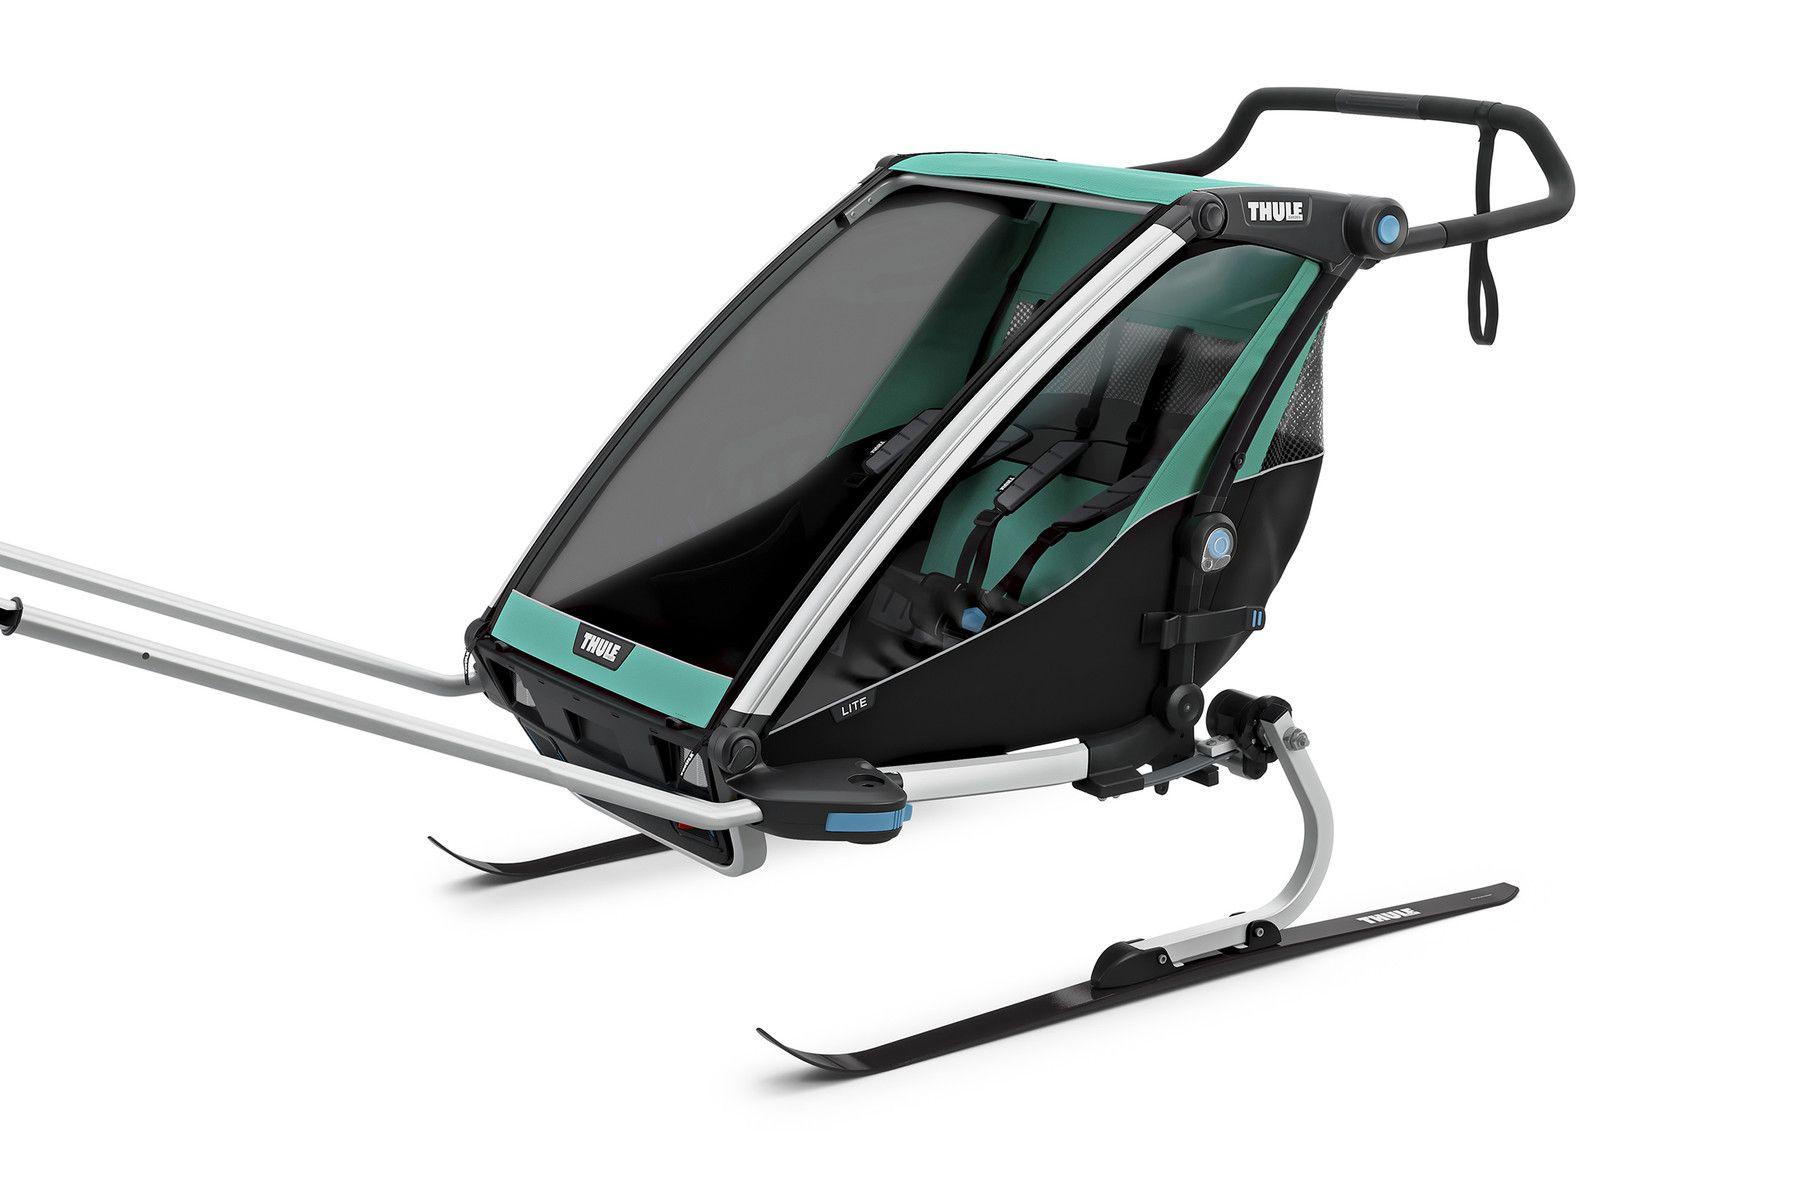 Thule Chariot Lite In 2020 Thule Chariot Thule Bike Lightweight Bike